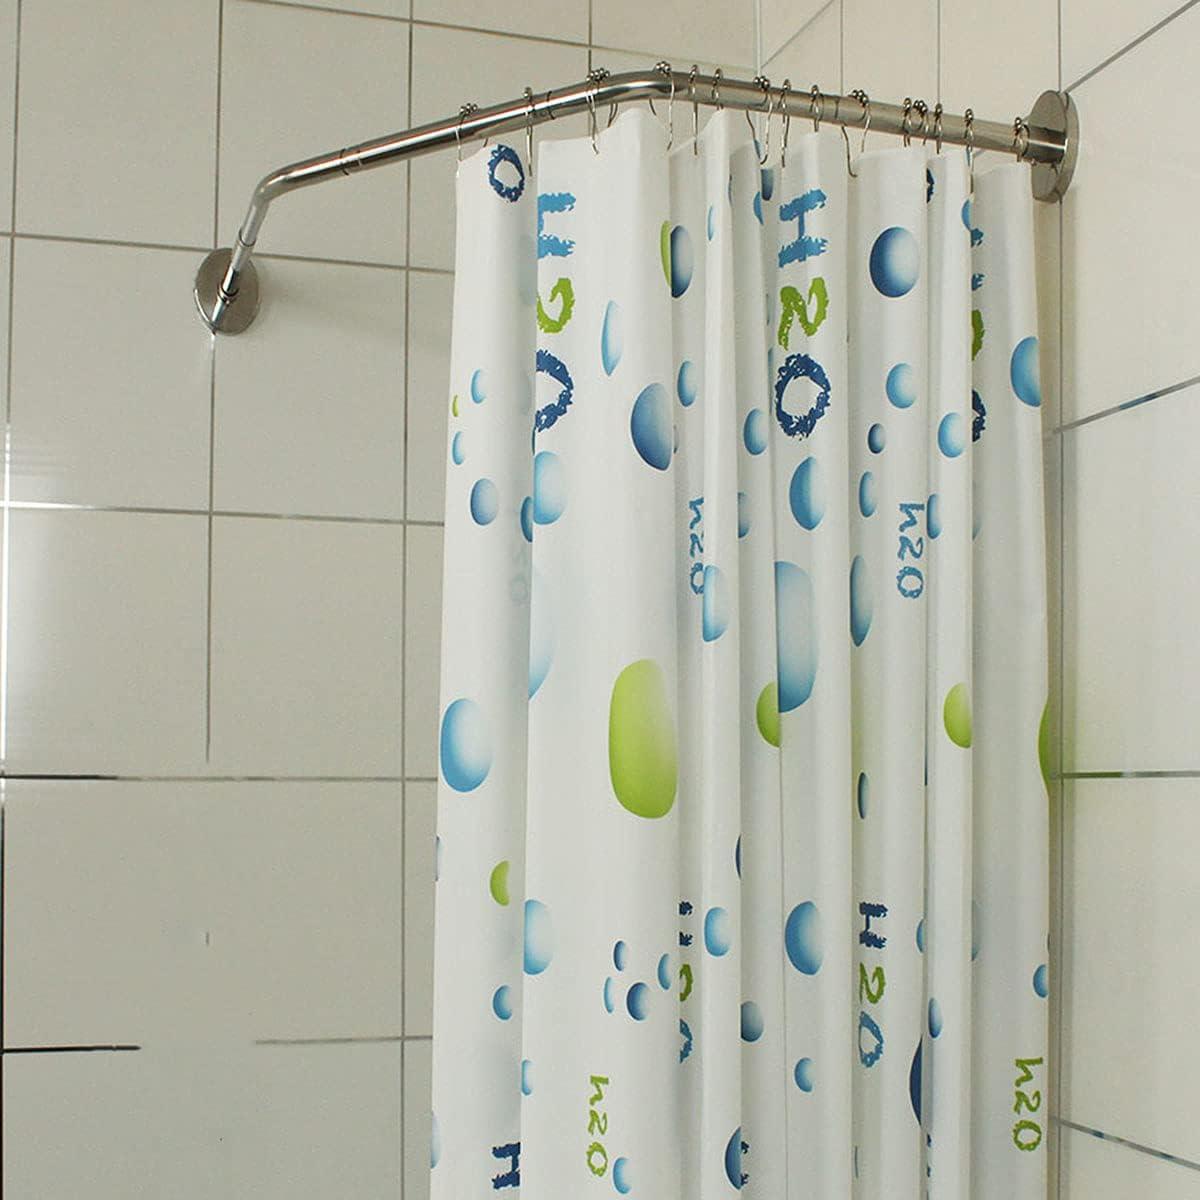 YLJXXY Bathroom Curved Shower Rod Curtain Mesa Mall New Free Shipping Rac Corner